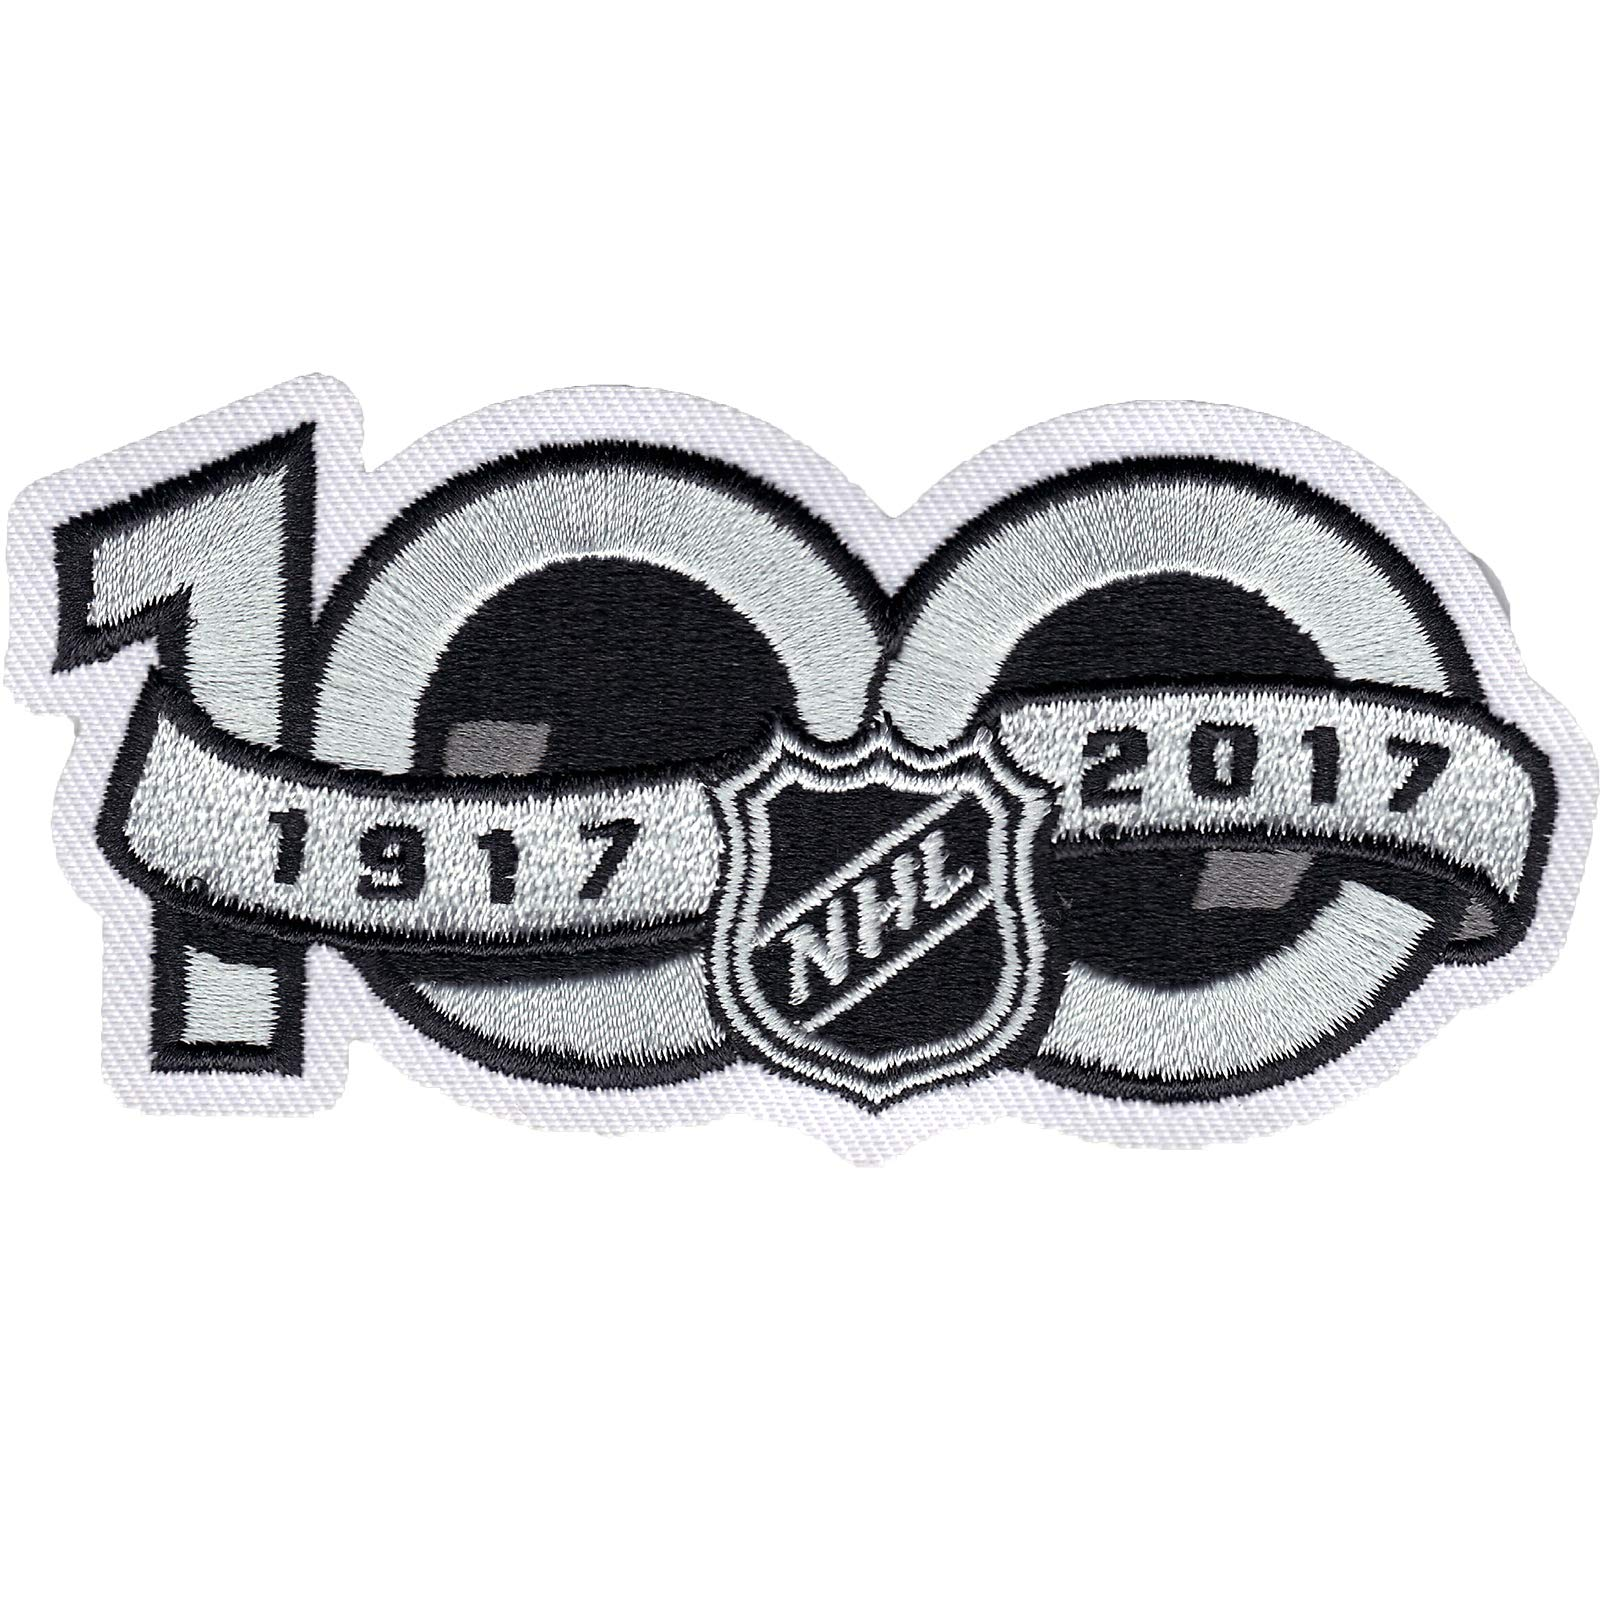 79dfde5b713 Amazon.com : National Hockey League NHL 100th Anniversary Jersey Sleeve  Logo Patch 2017 Season : Clothing